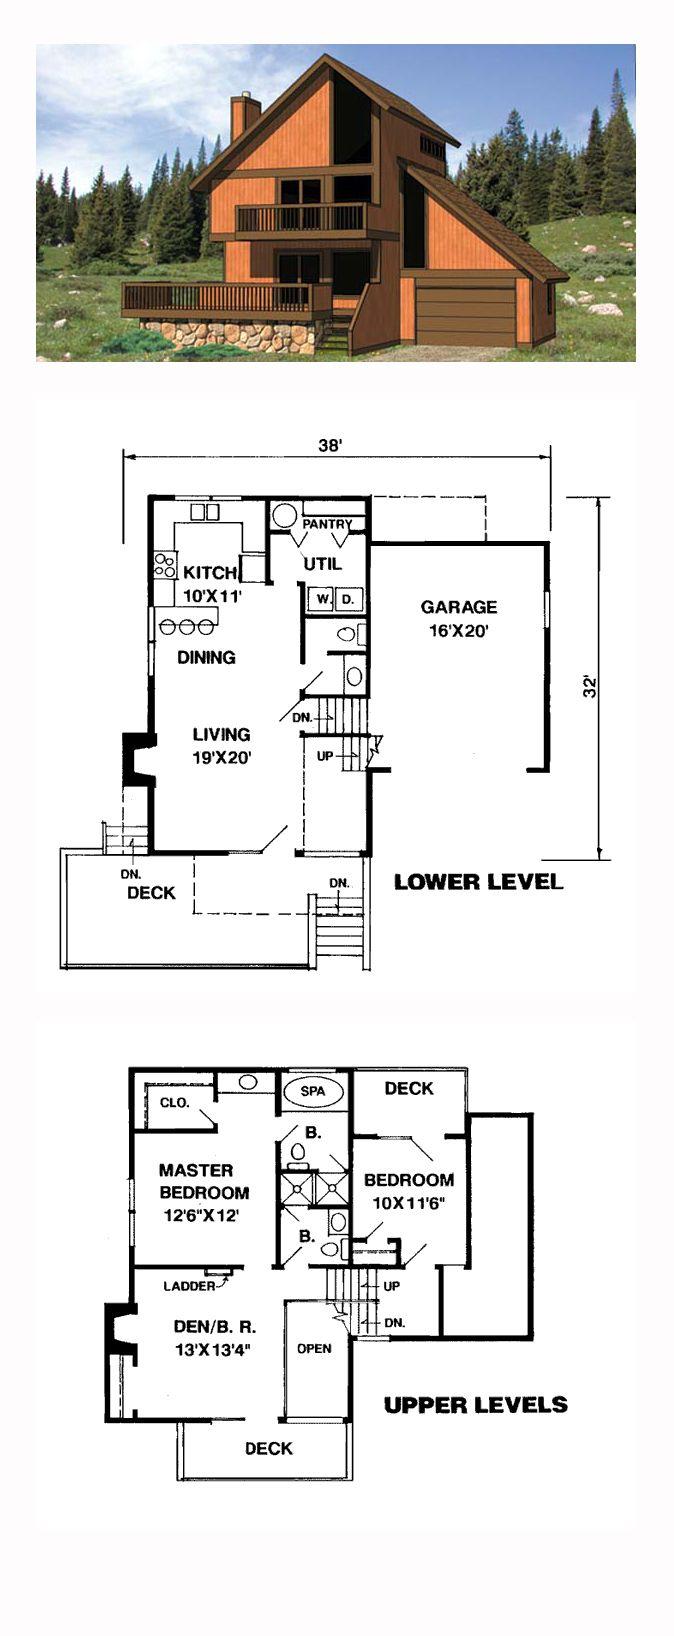 Bachelor 484 sq ft log home kit log cabin kit mountain ridge - Cabin Contemporary House Plan 94310